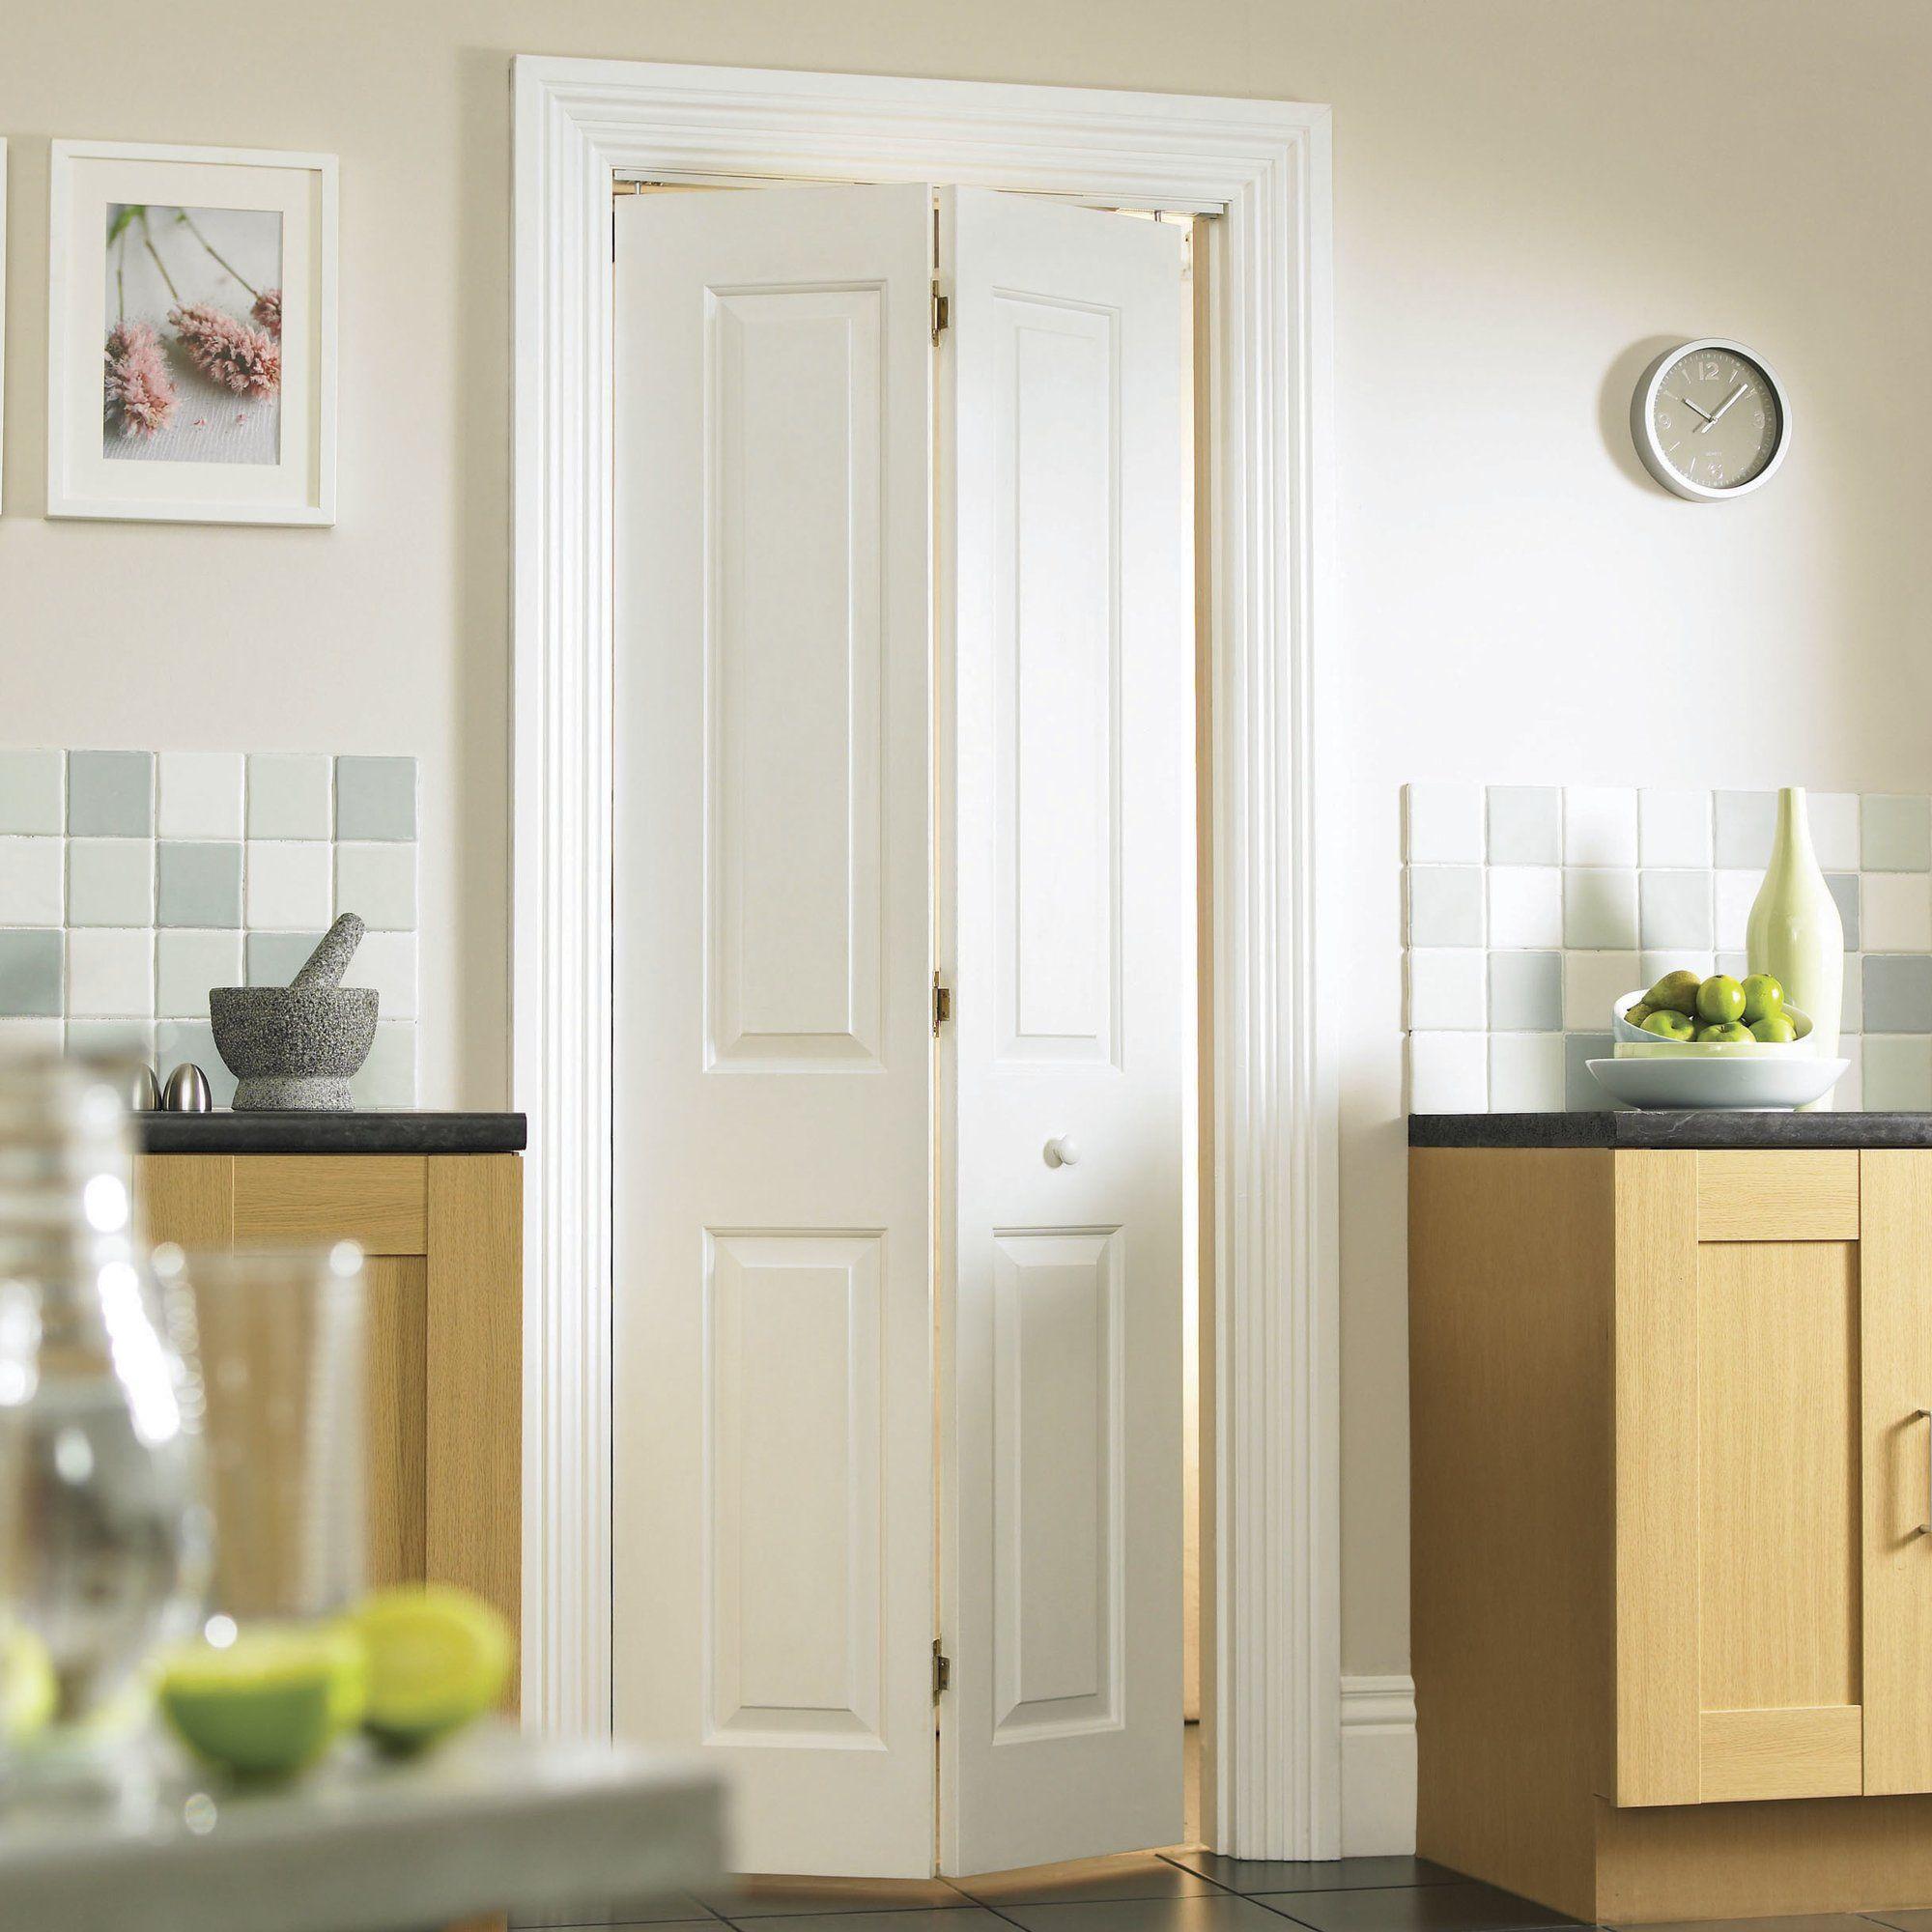 Atherton 4 Panel White Smooth Bi-Fold Internal Door & Atherton 4 Panel White Smooth Bi-Fold Internal Door | House ...